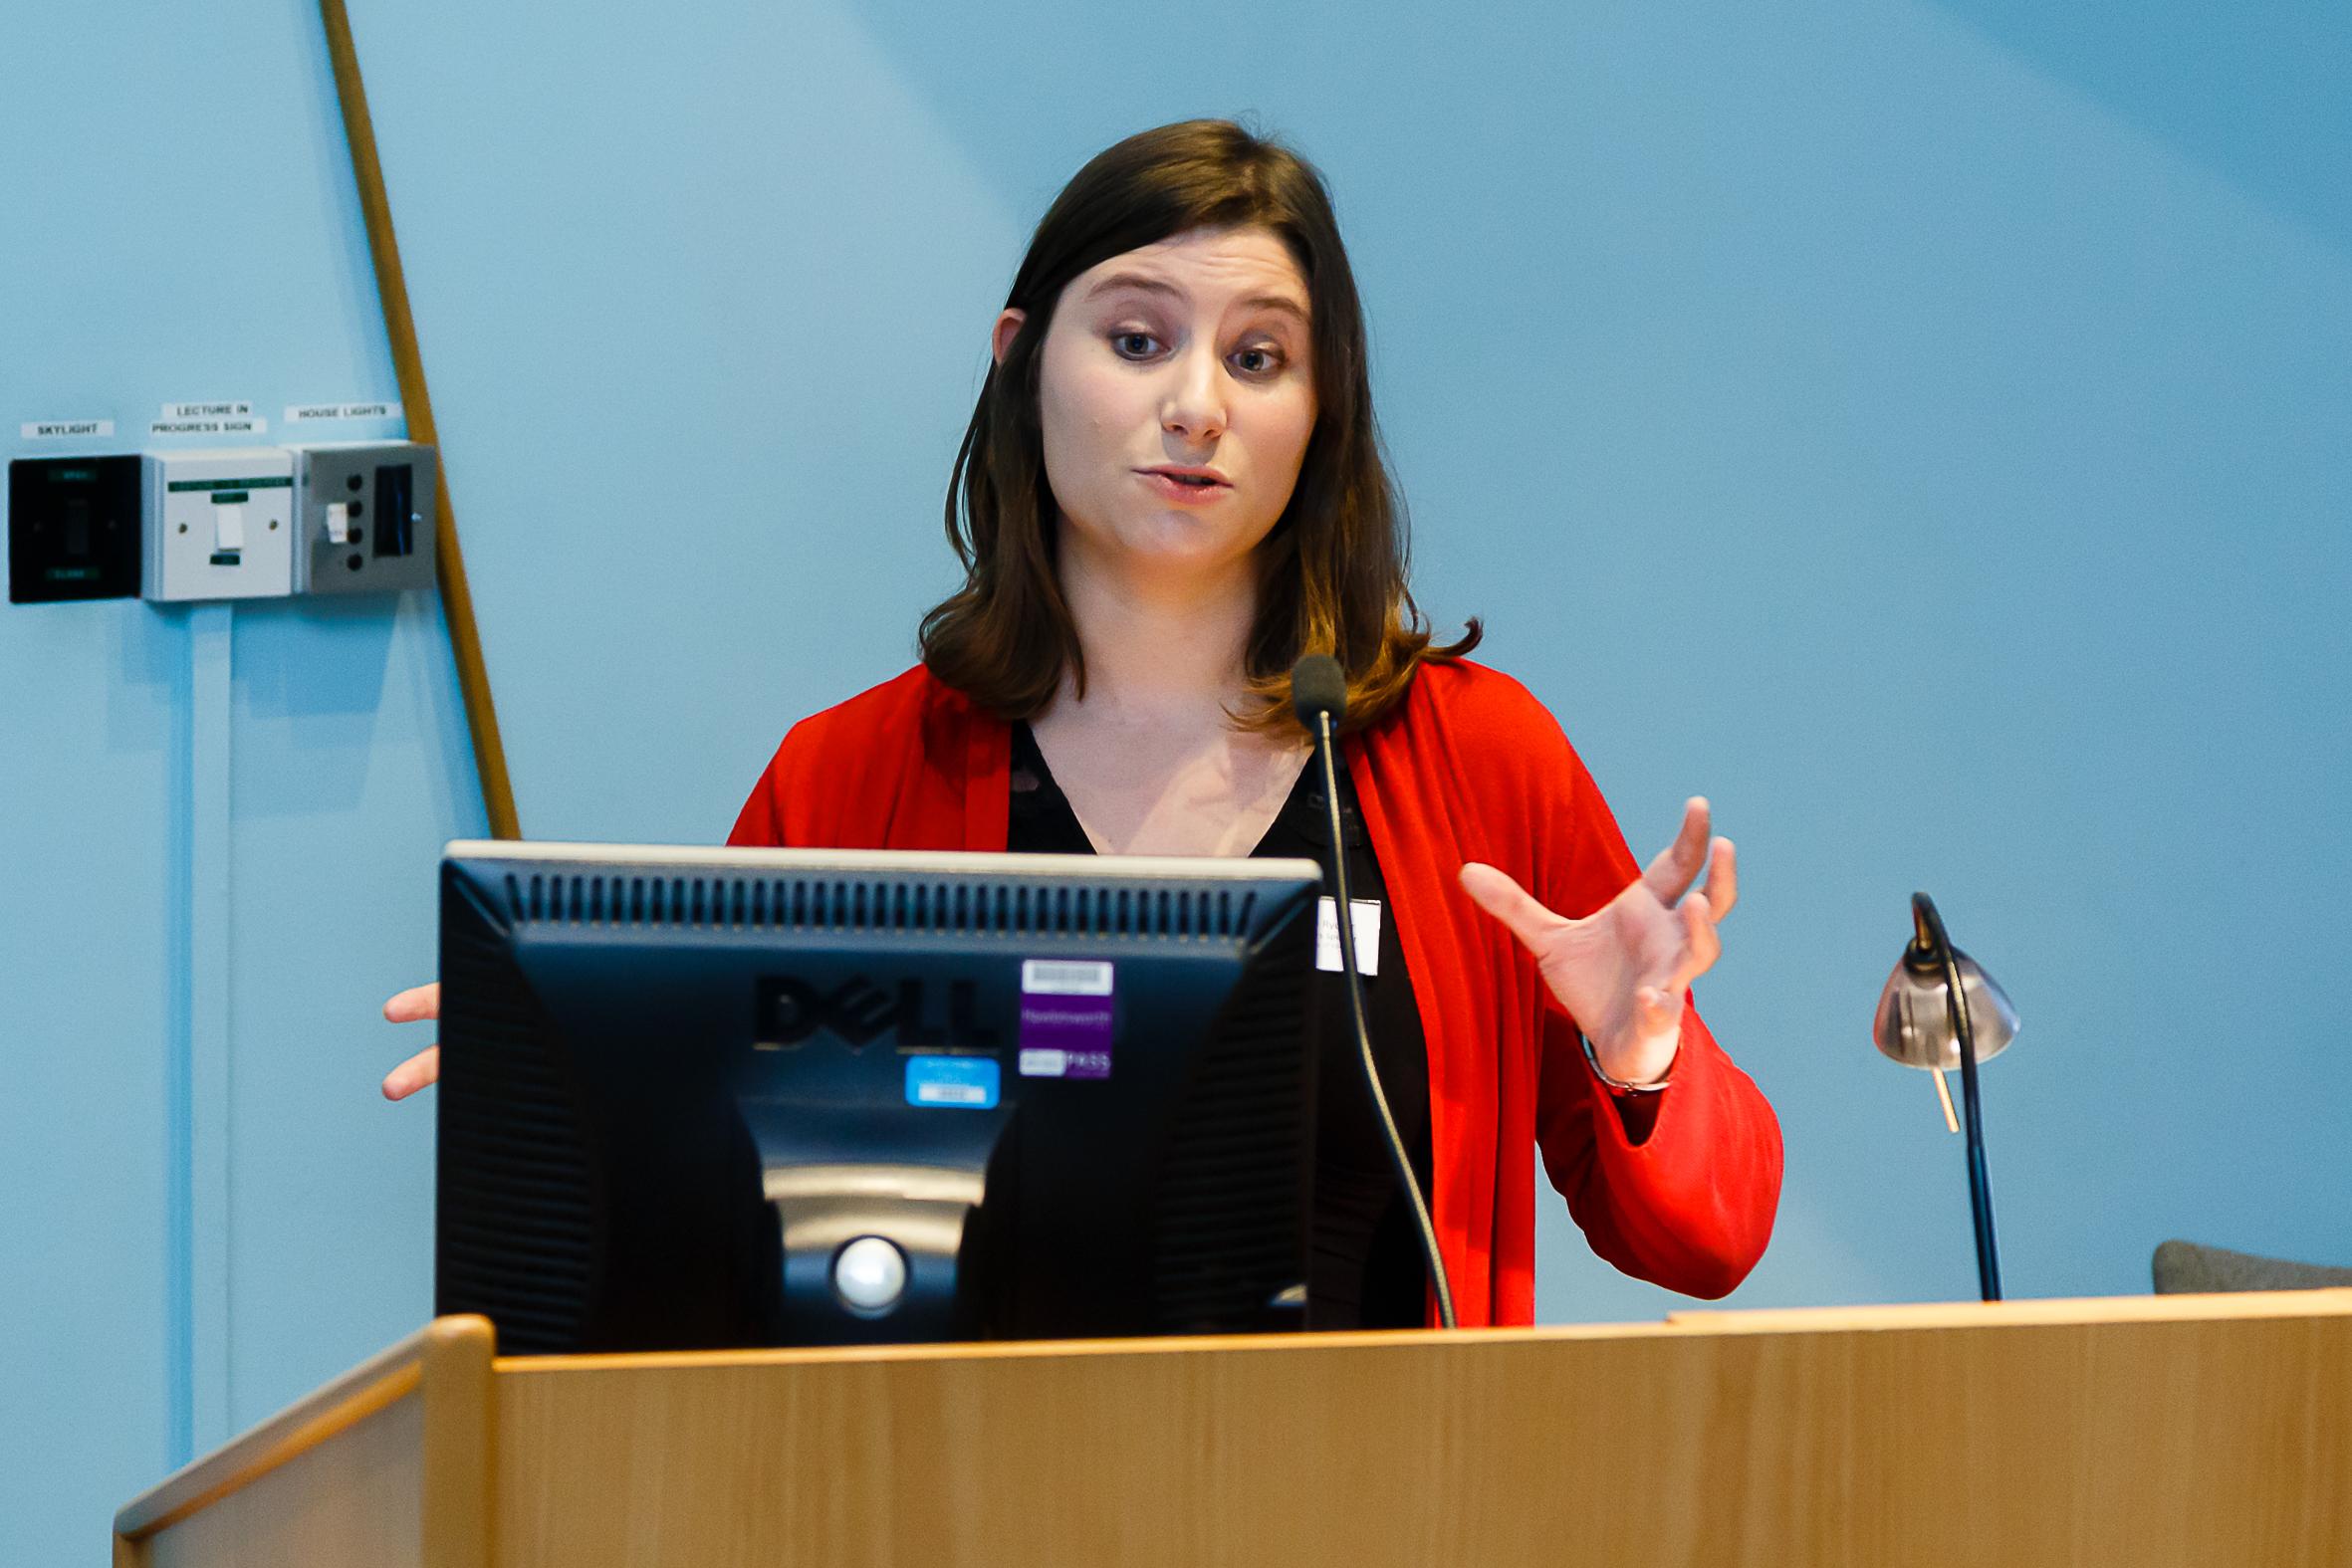 Kate de Rycker - Former University of Kent TEEME Student